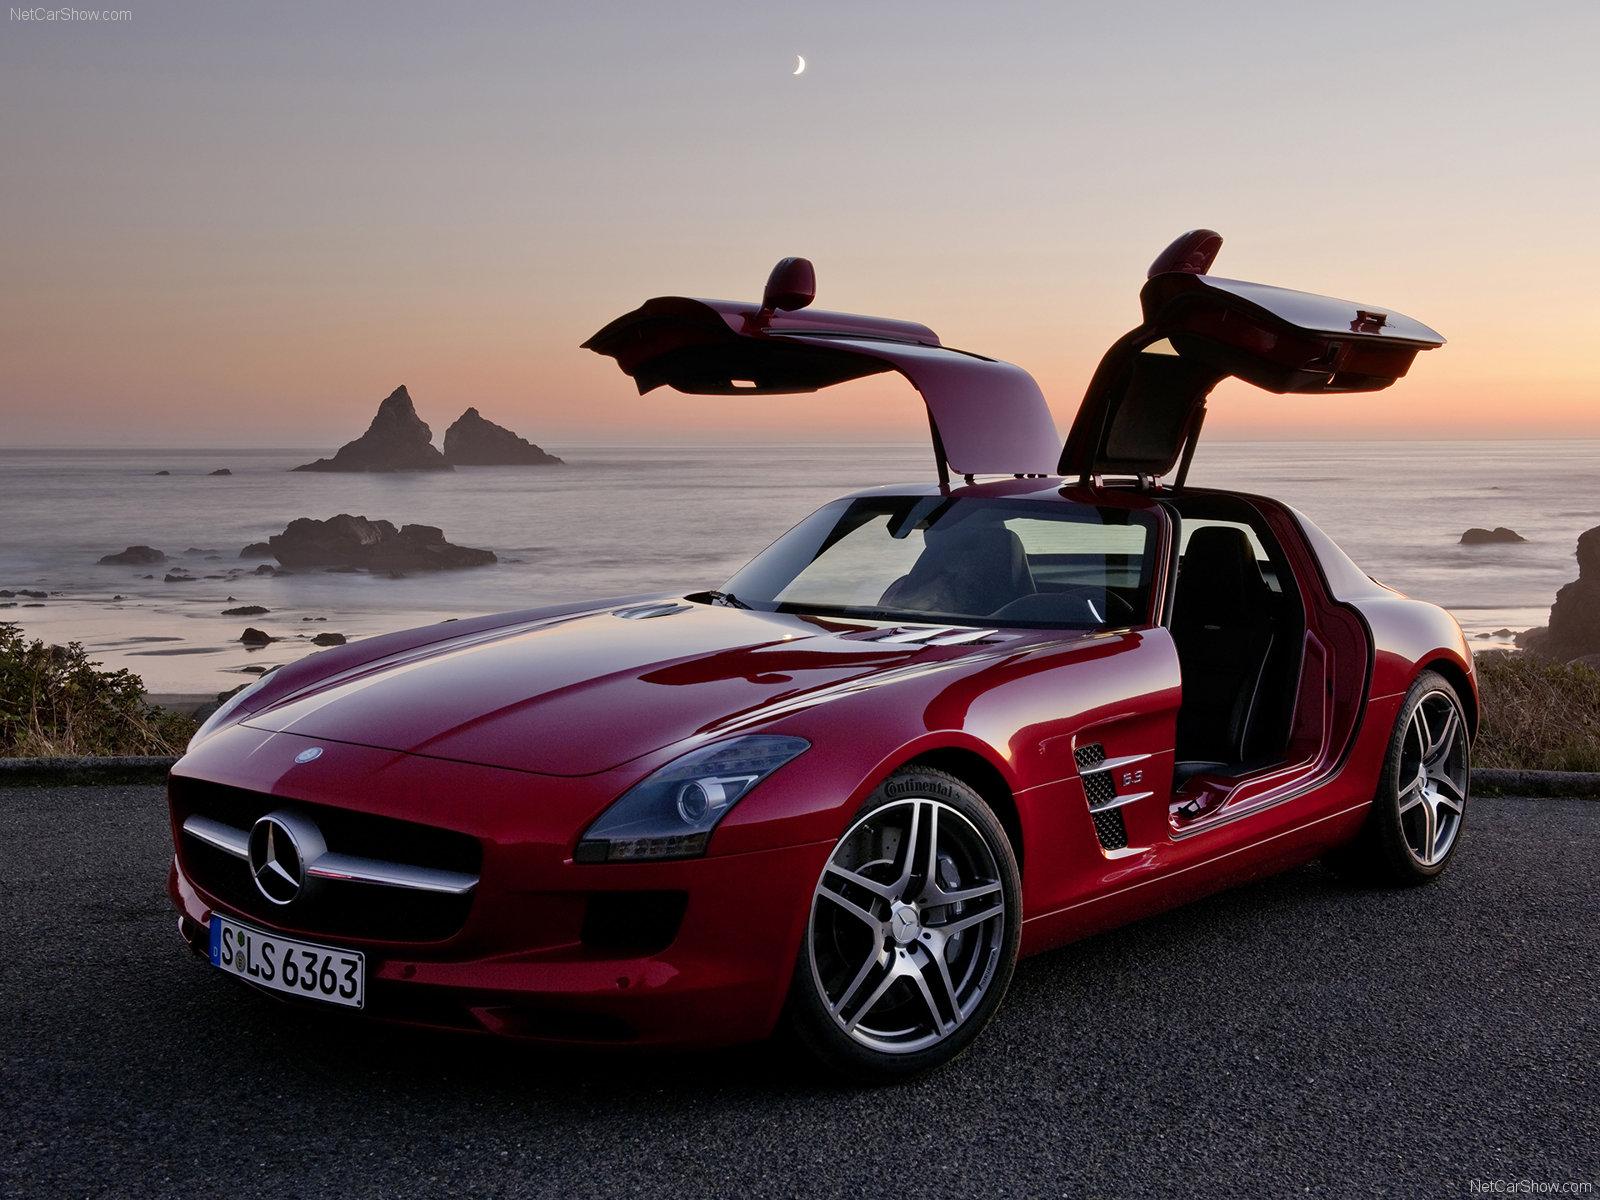 http://4.bp.blogspot.com/-Nvhpxtfhi9U/Tposkhk4_XI/AAAAAAAARaI/YxmaYHJAsC8/s1600/Mercedes-Benz-SLS-AMG-2011_Red_1600x1200.jpg